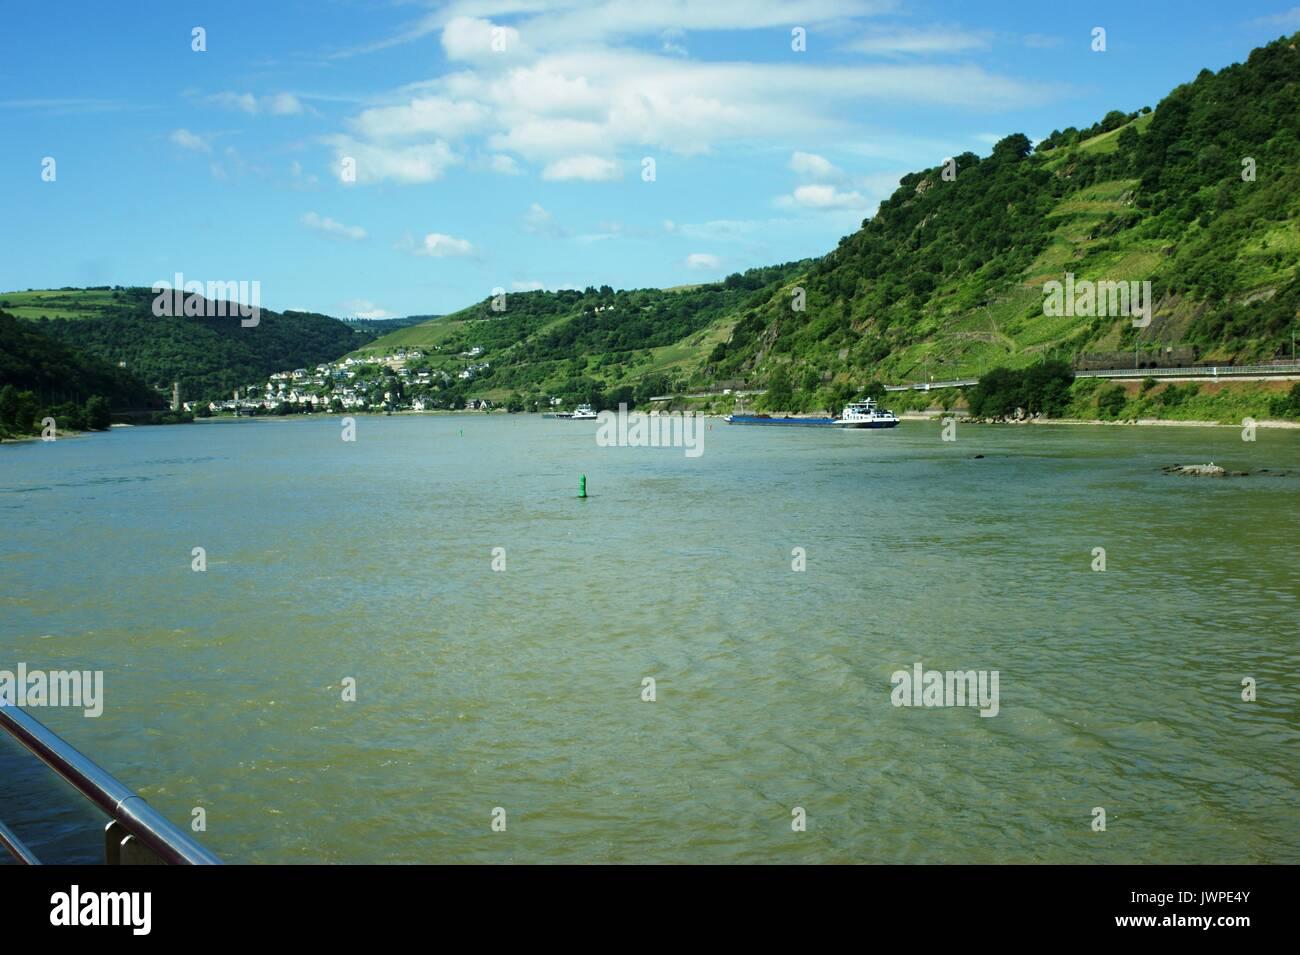 The River Rhine near the Loreley rocks, Germany Stock Photo